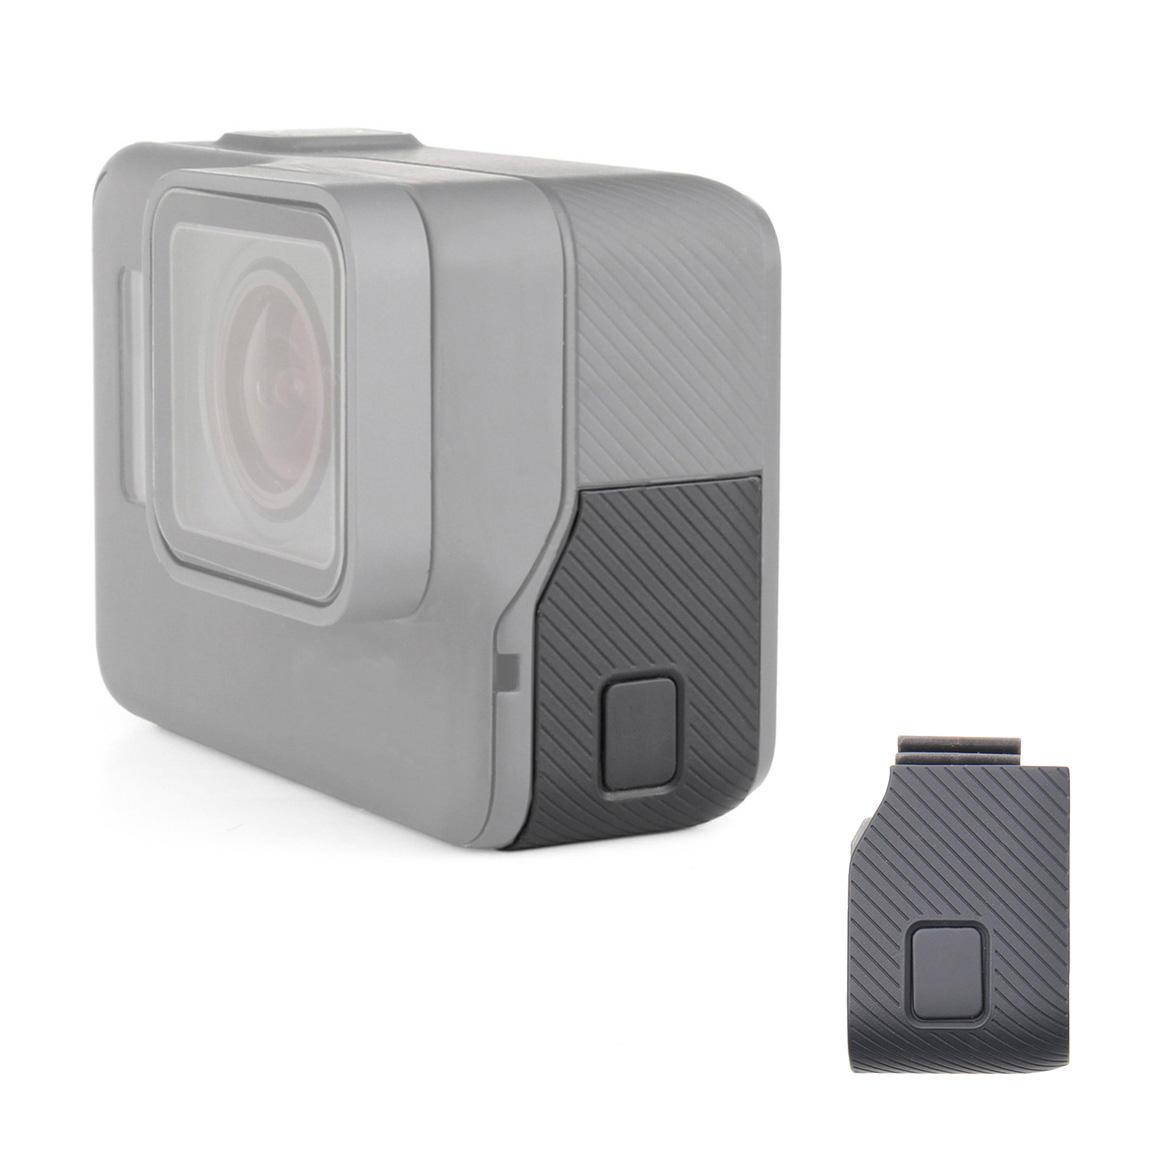 Replacement Side Door USB-C Mini HDMI Port Side Cover Repair for GoPro HERO 5 HERO 6 Sport Cameras